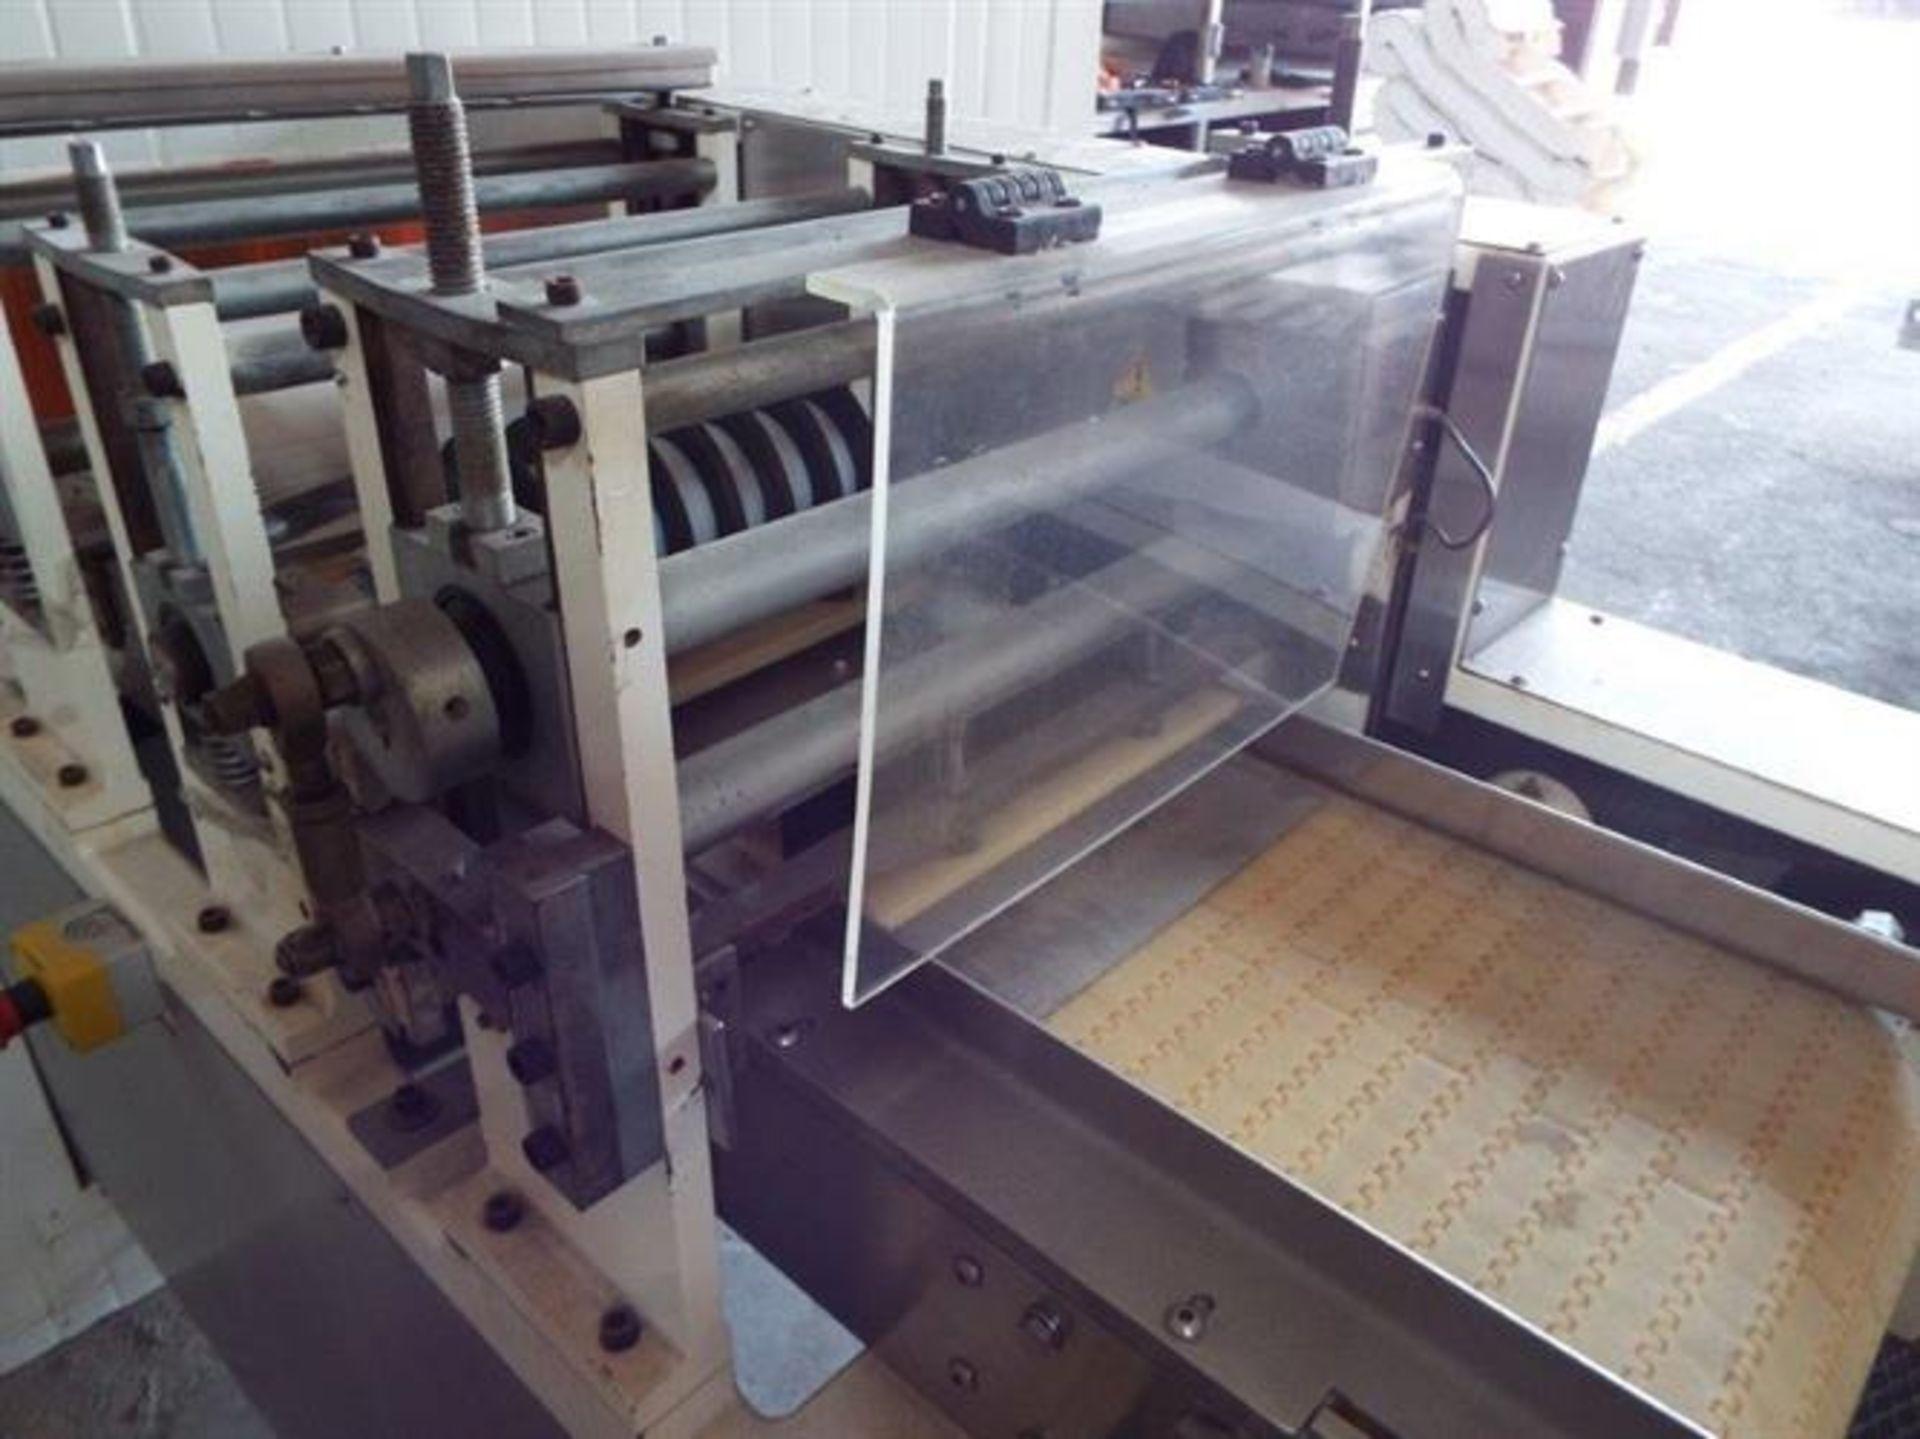 Tecmaq 290 mm Wide Slab Forming Line - Model TM-6H built 2012 - Three sets of gauging/sheeting - Image 20 of 30